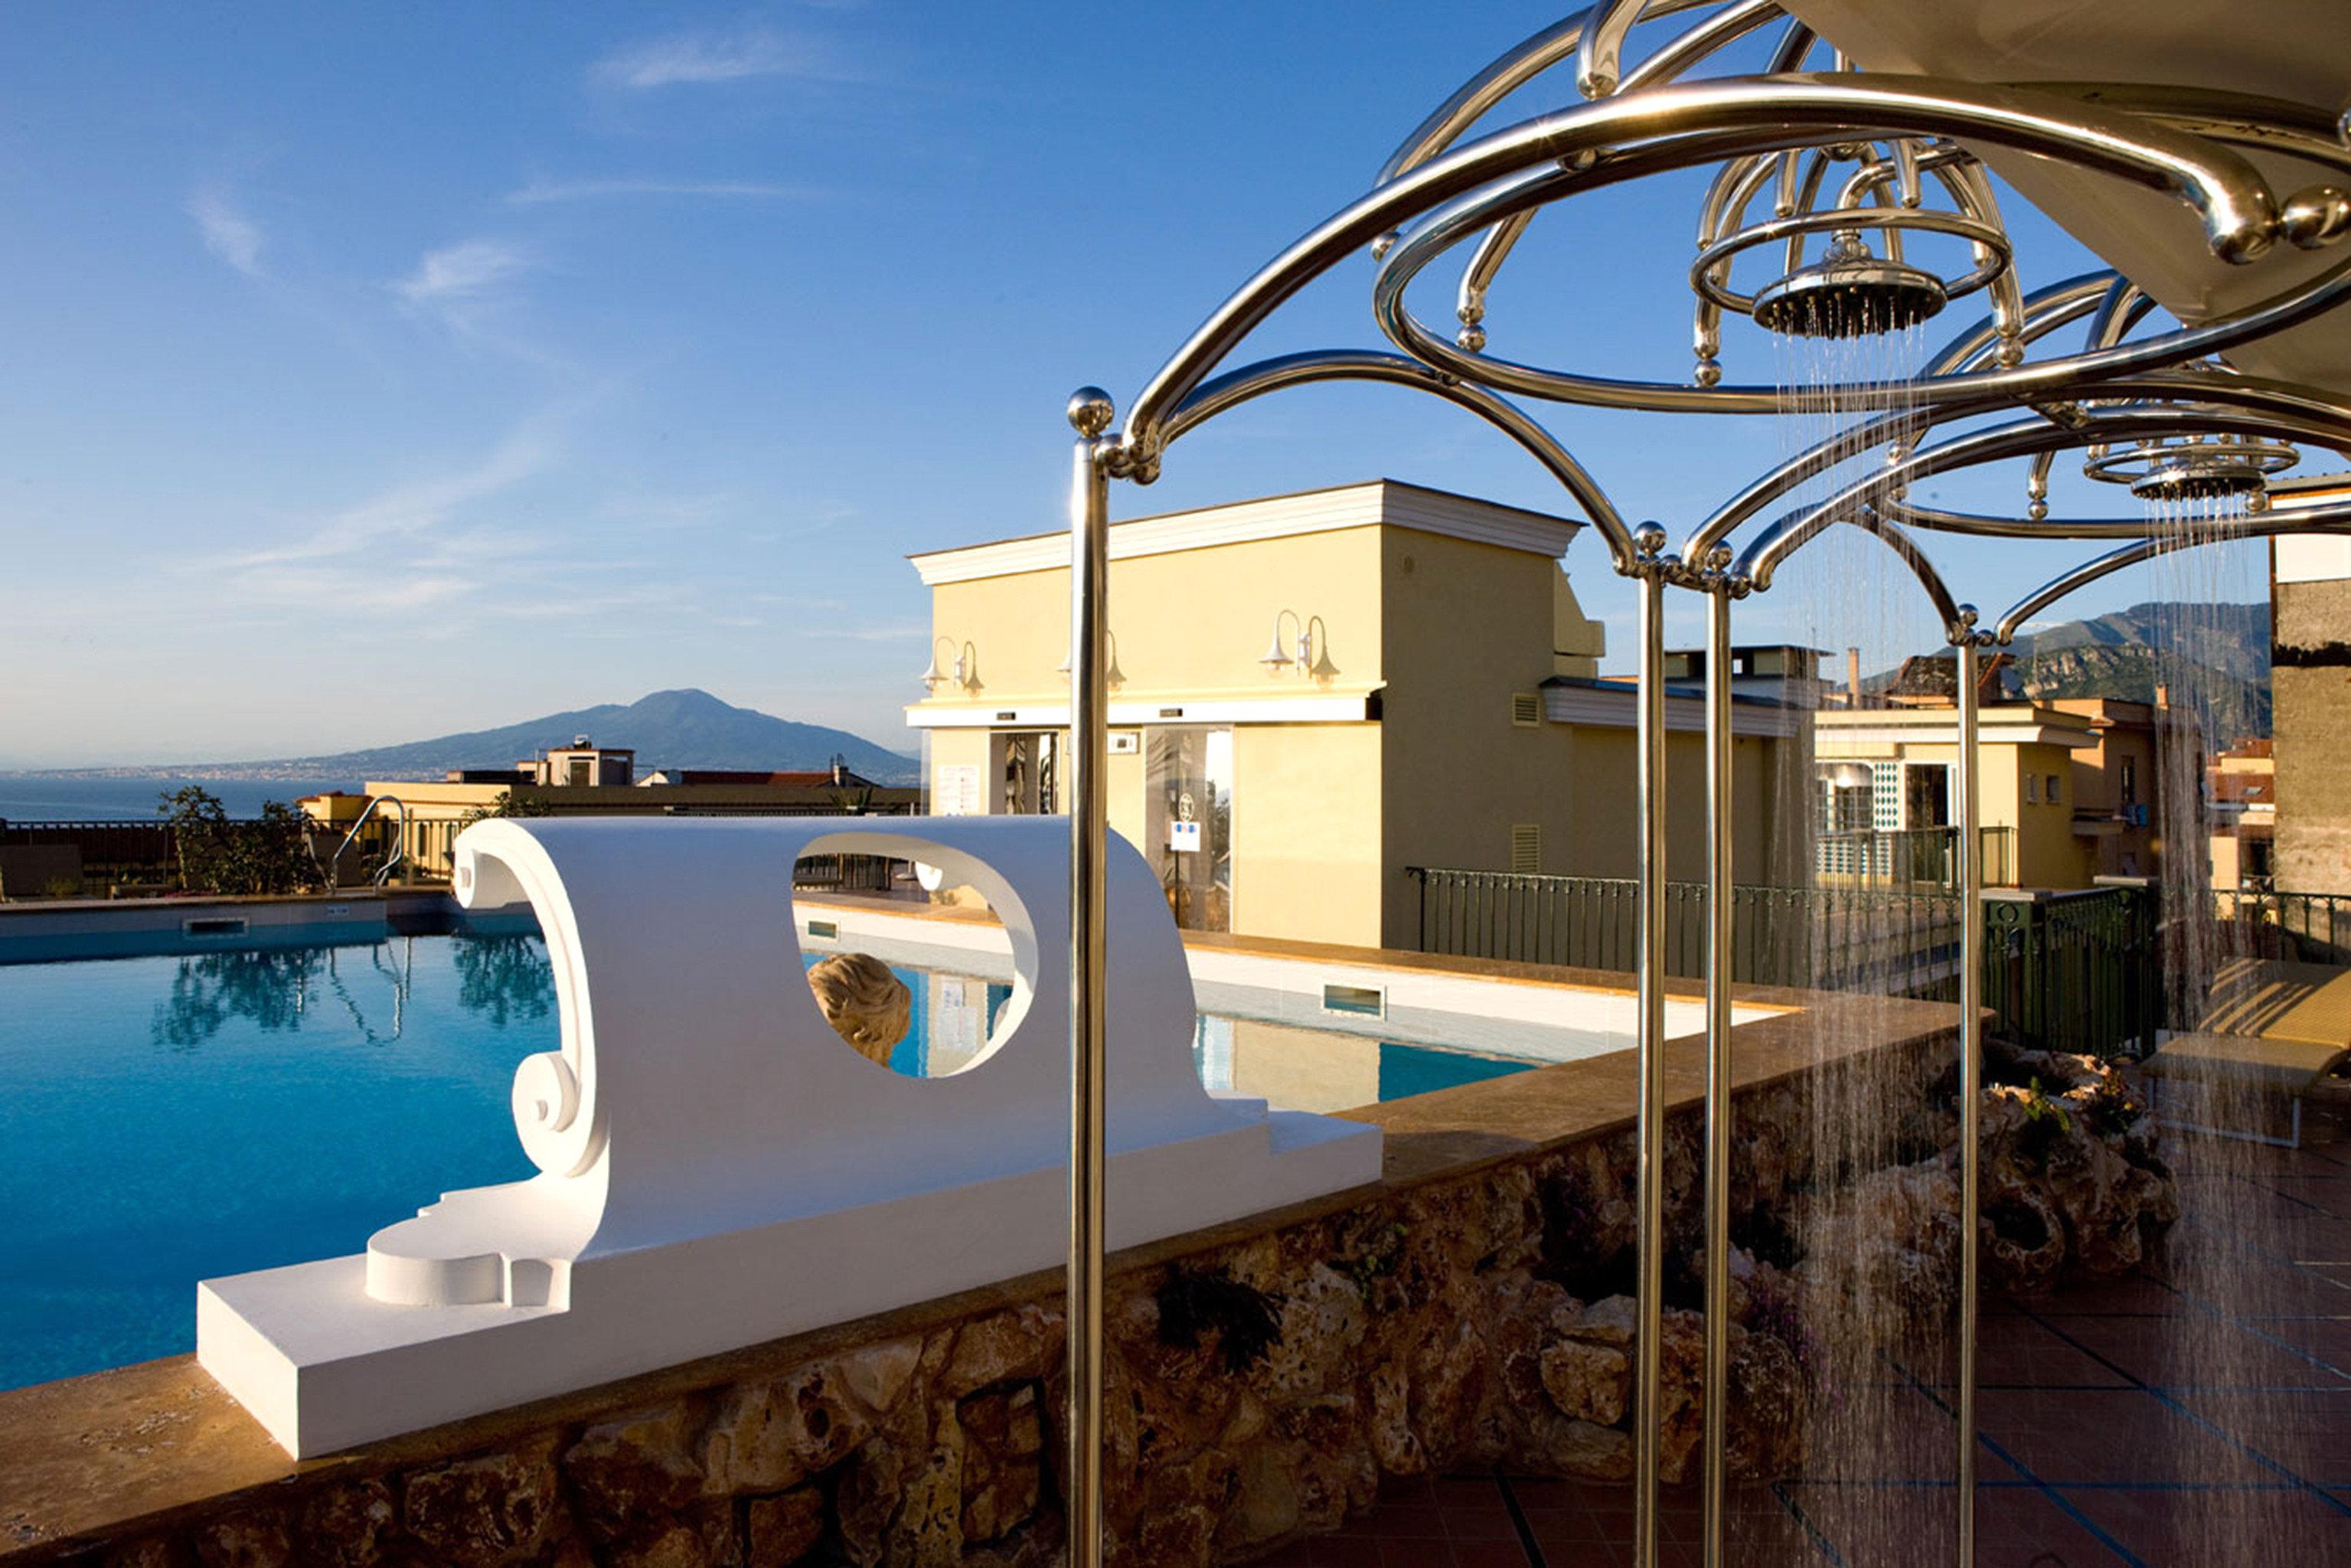 Classic Pool Scenic views Sea sky swimming pool Resort home restaurant Villa